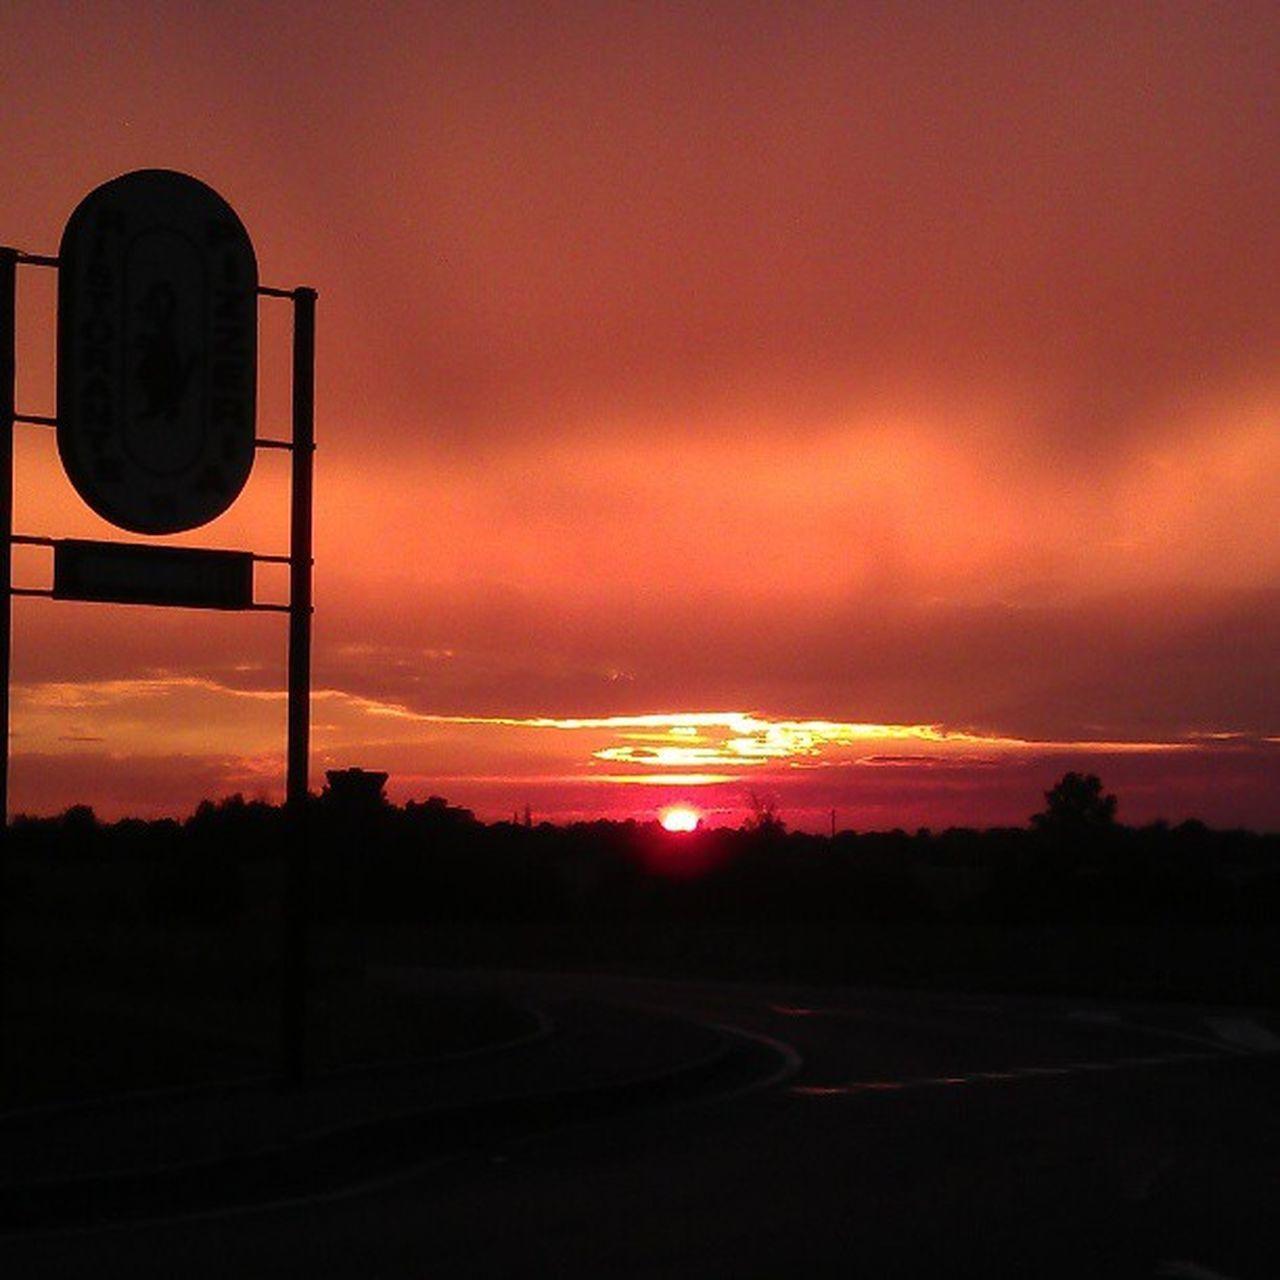 Sunset Sunset Silhouettes